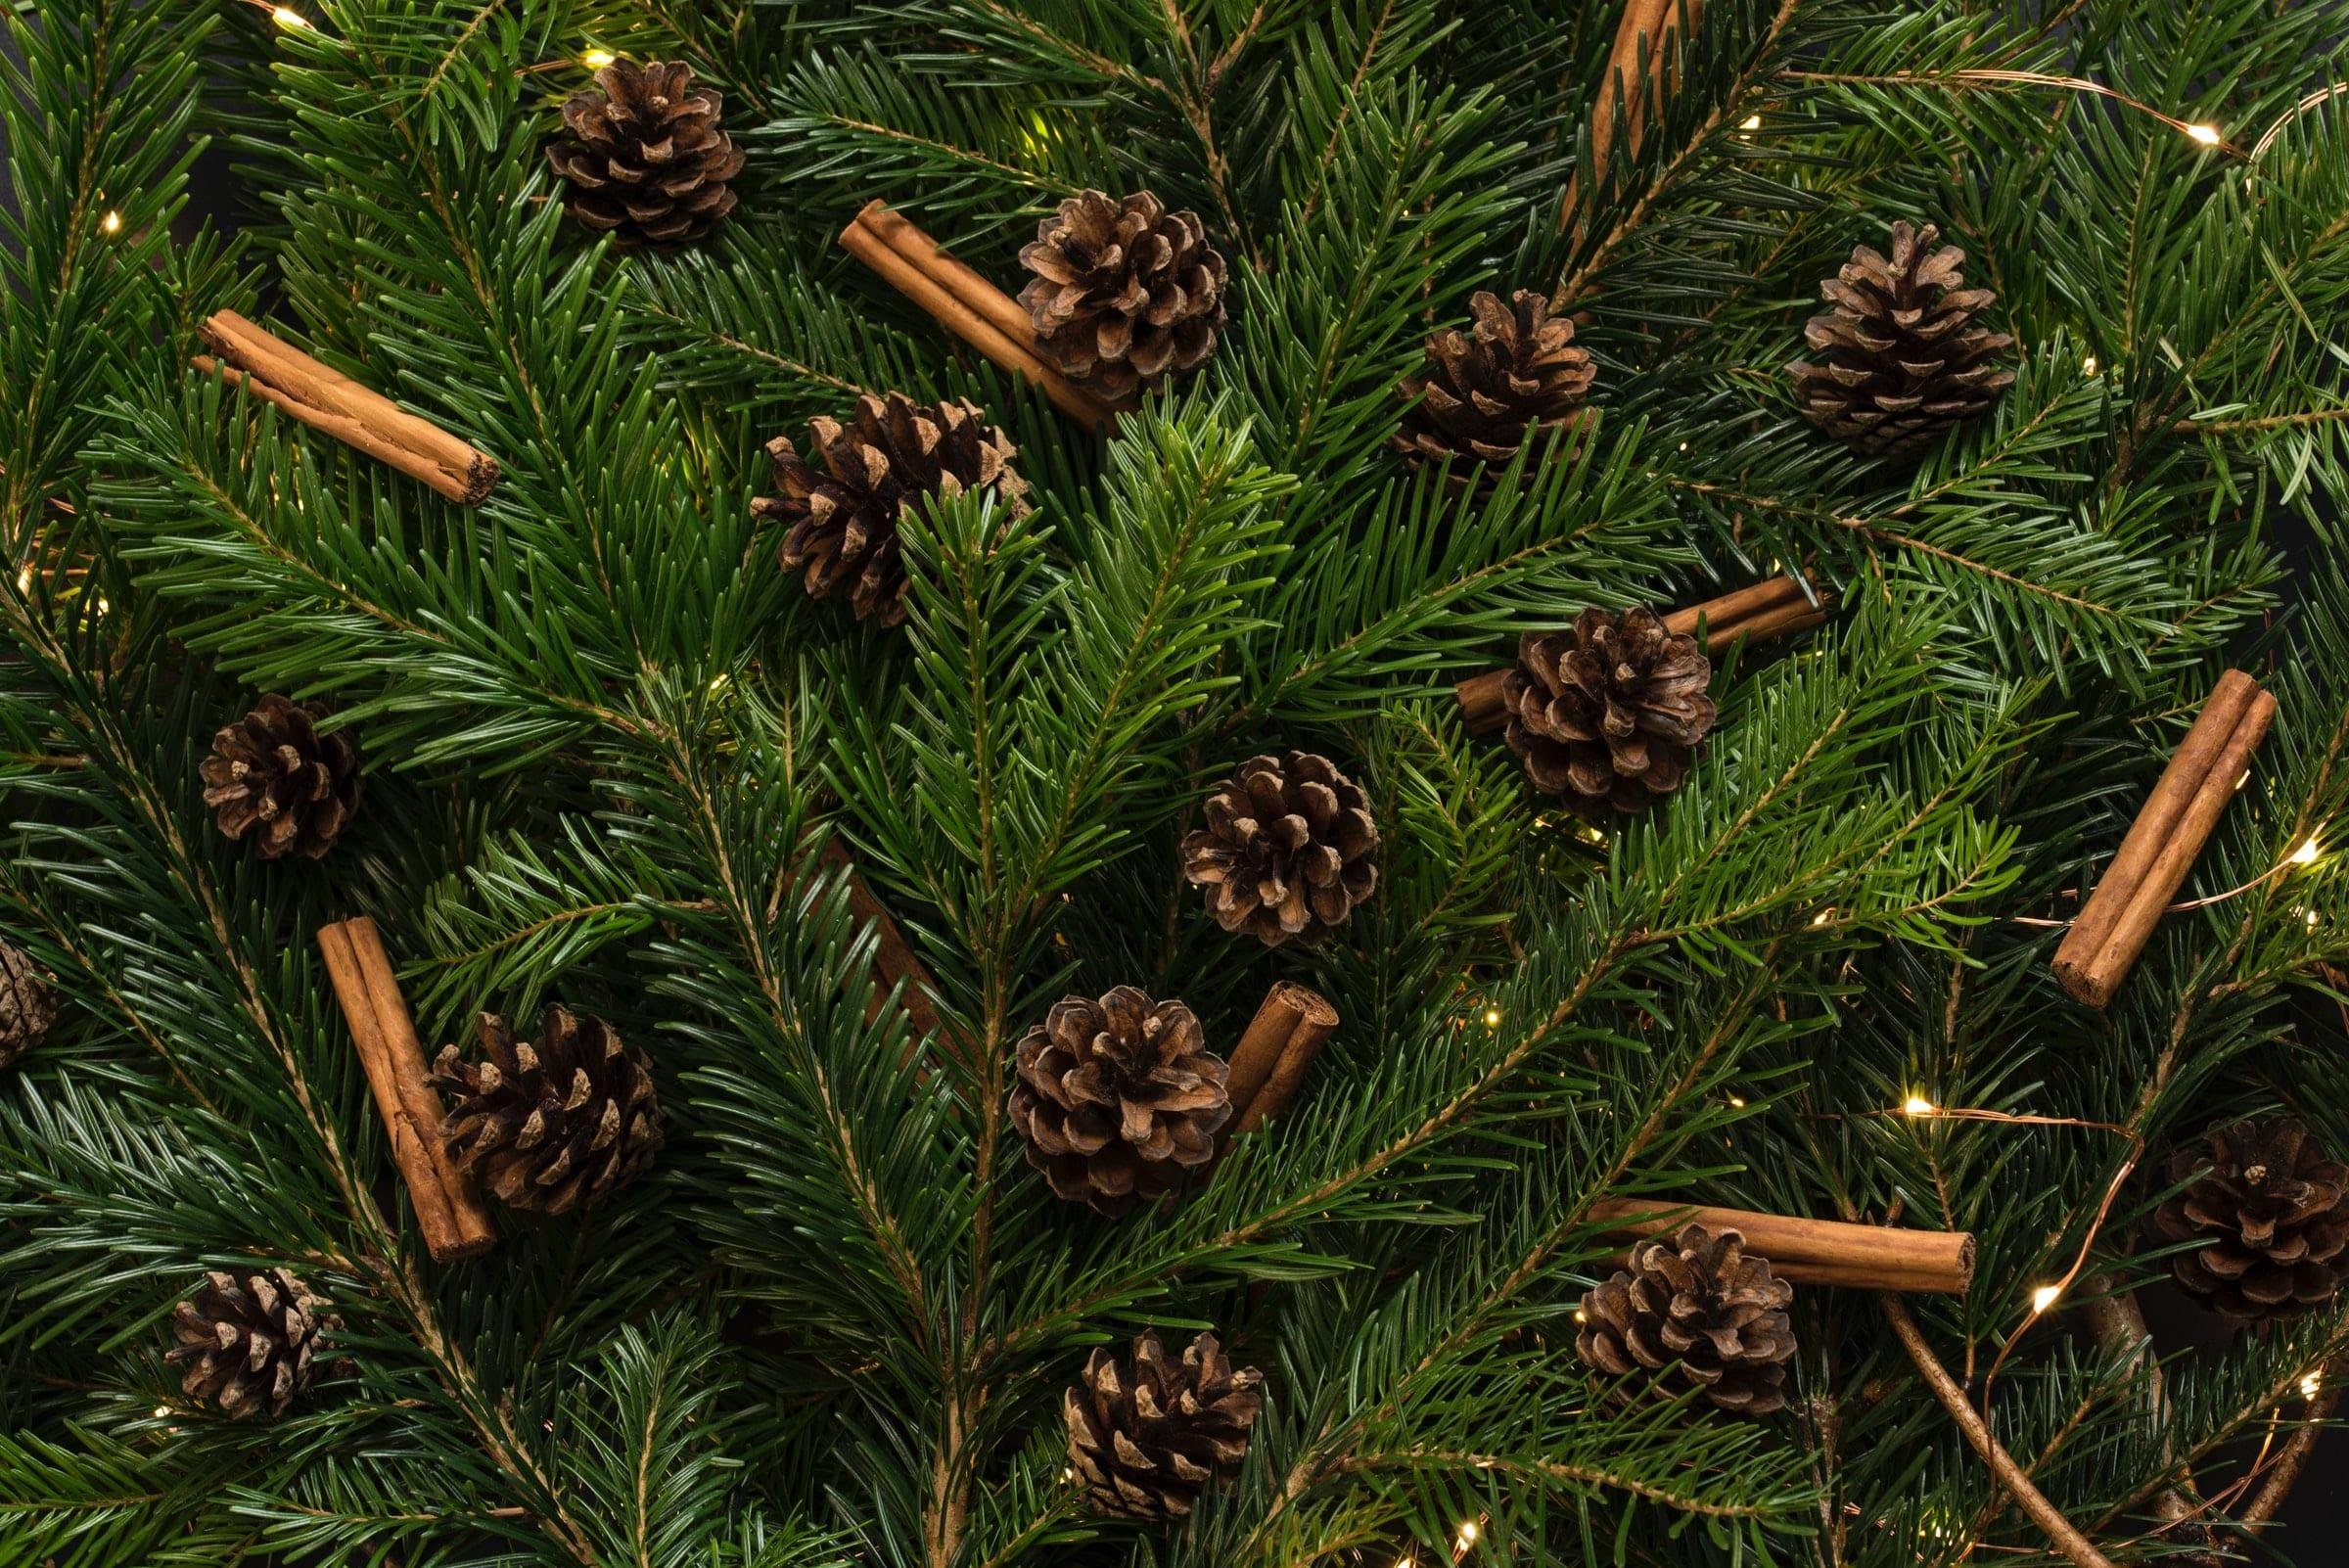 Holiday Tree & Pinecones